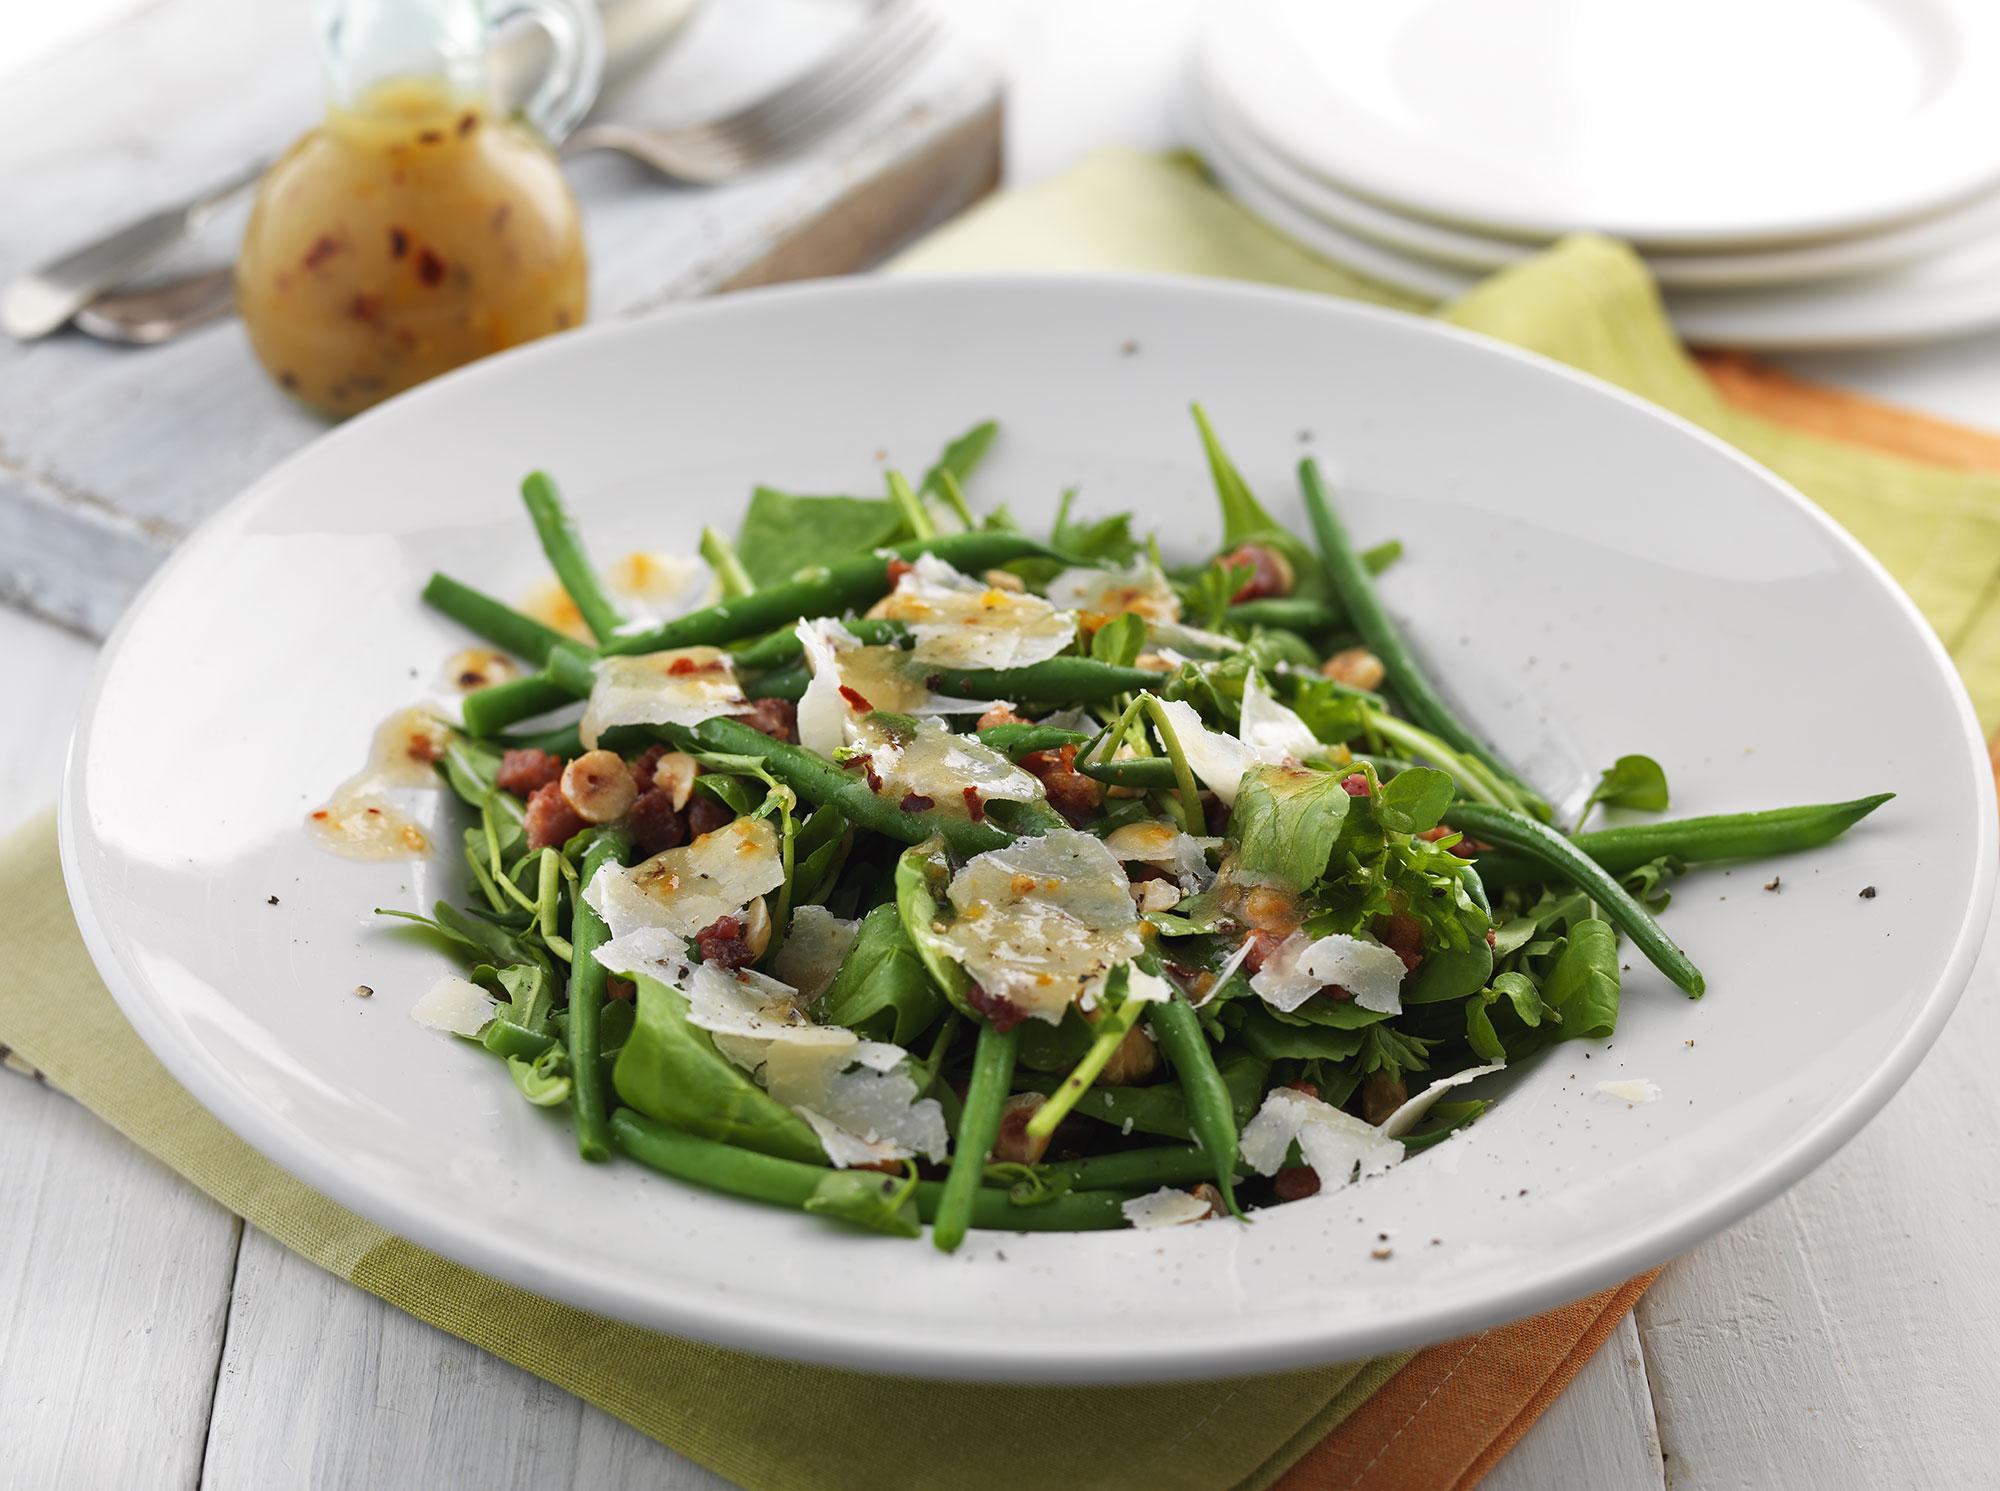 Spinach, Pancetta and Pecorino Salad